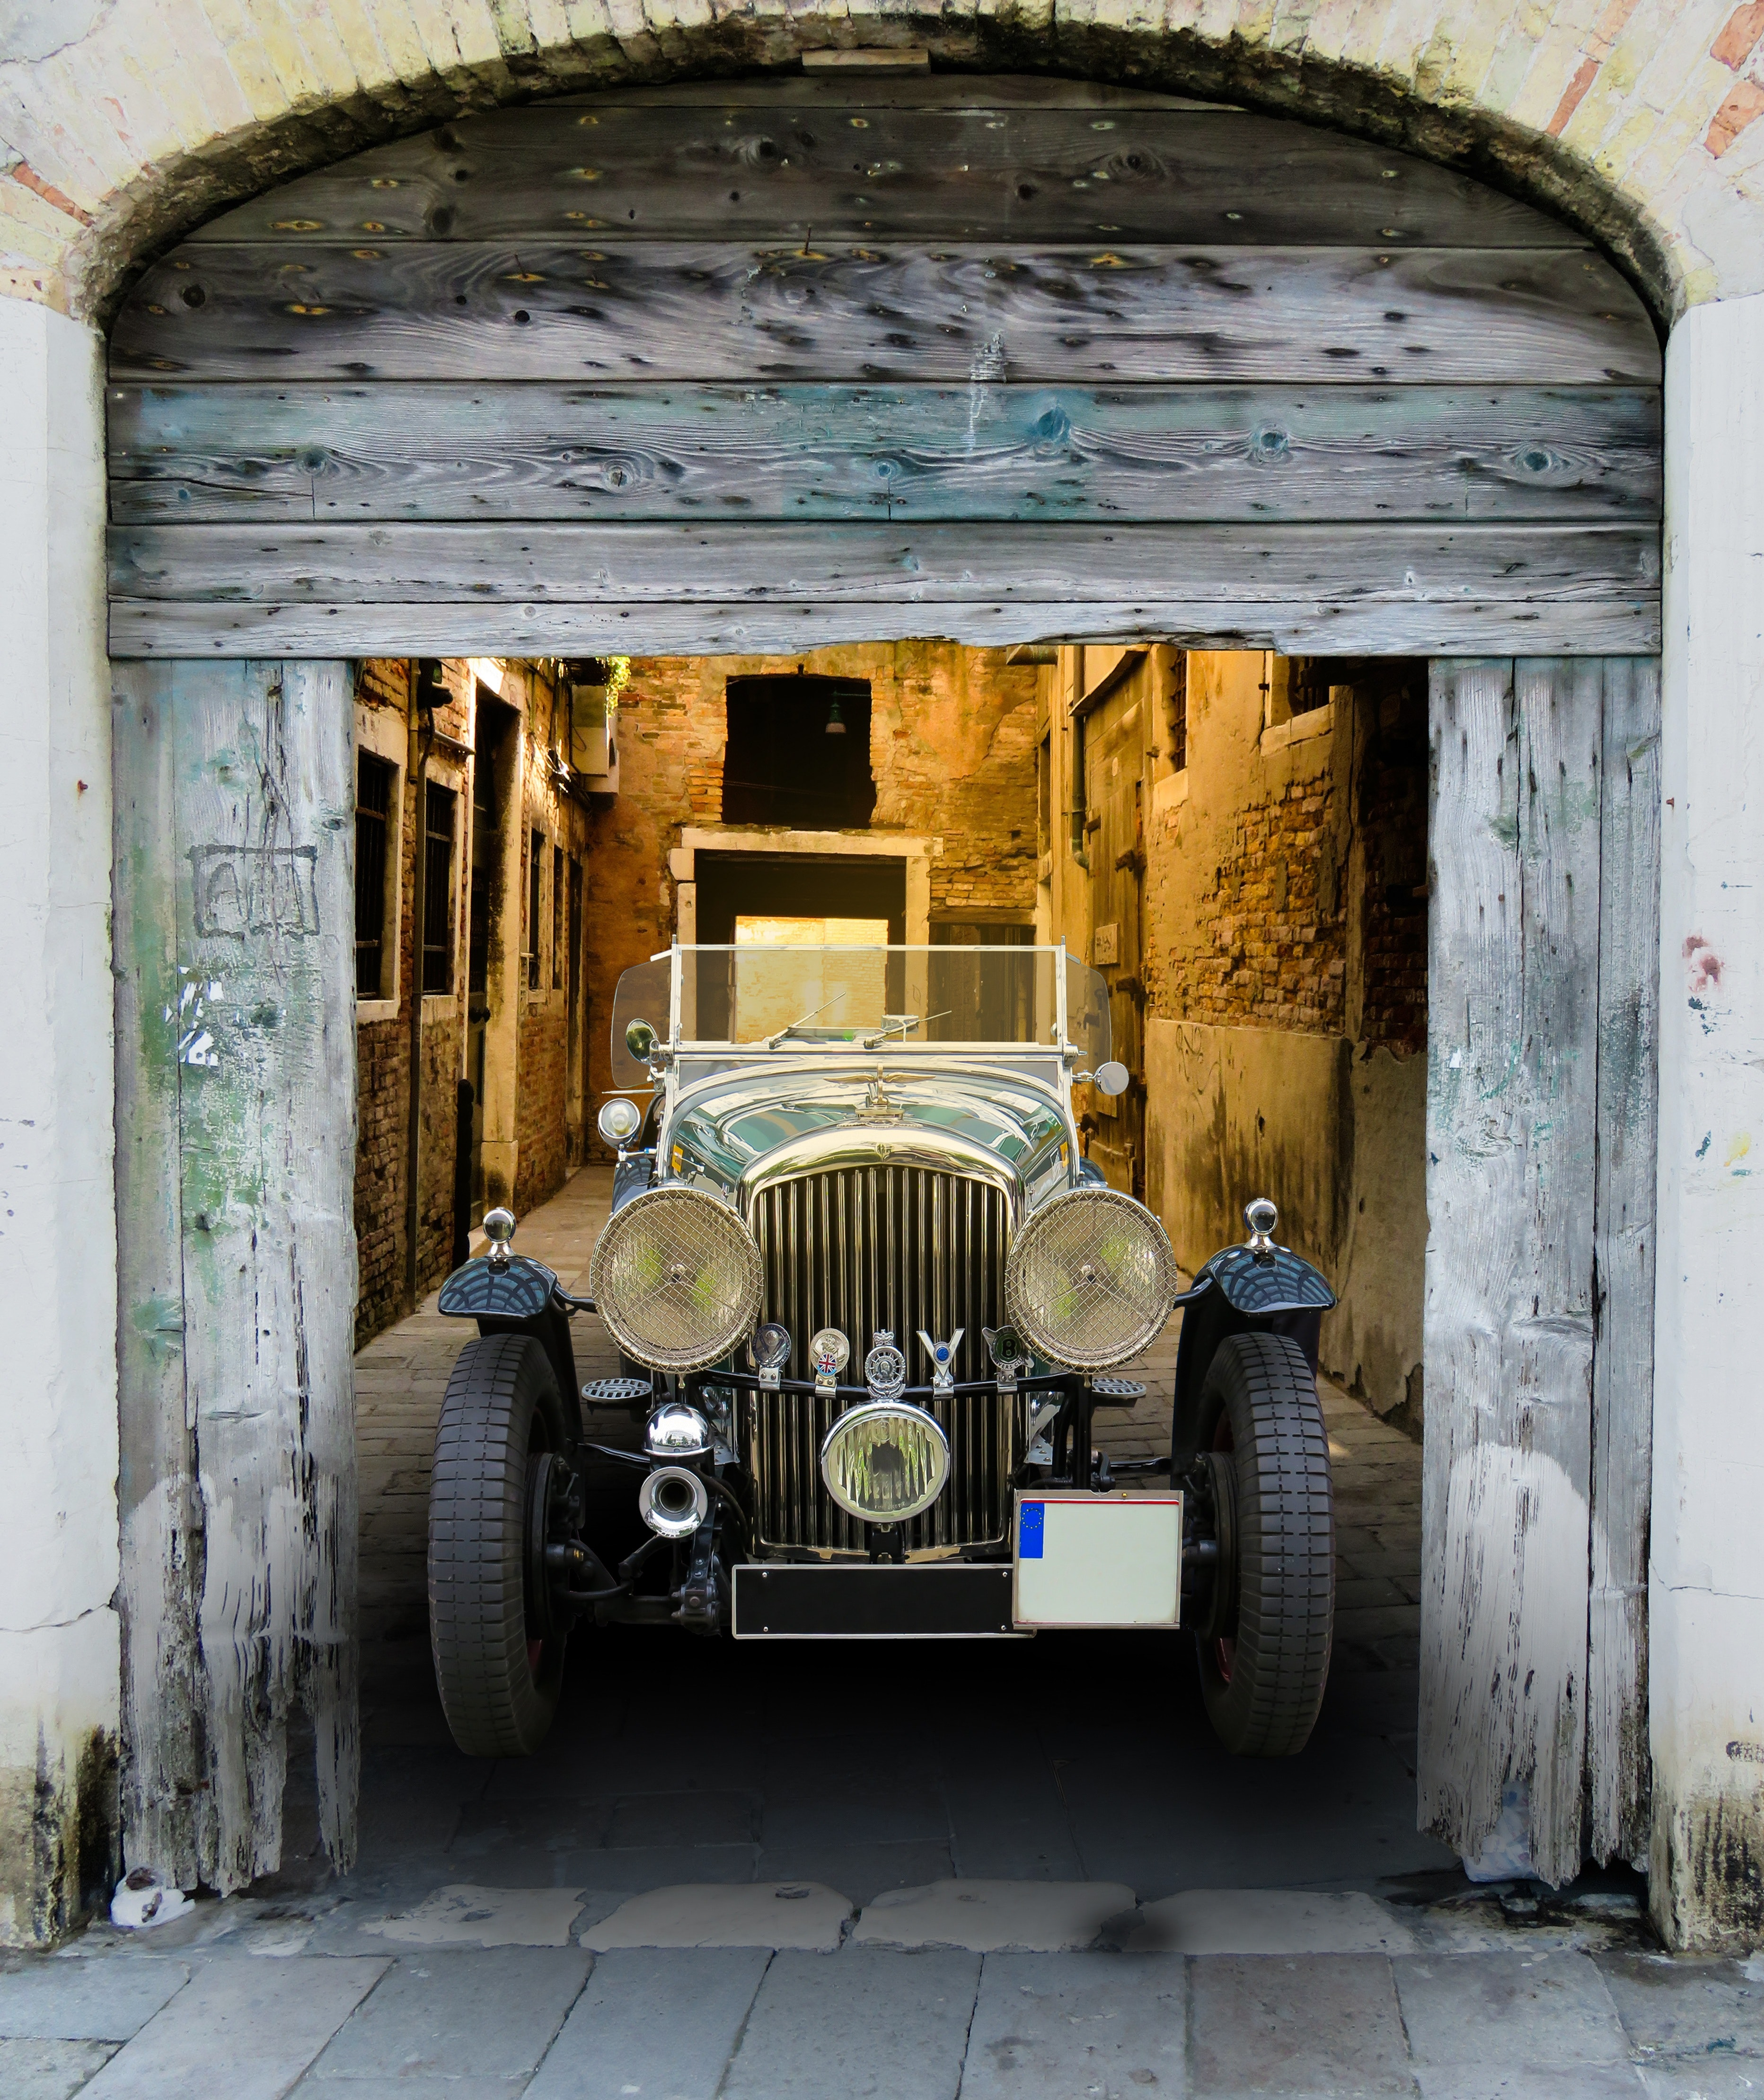 Black Classic Car Inside The Garage 183 Free Stock Photo